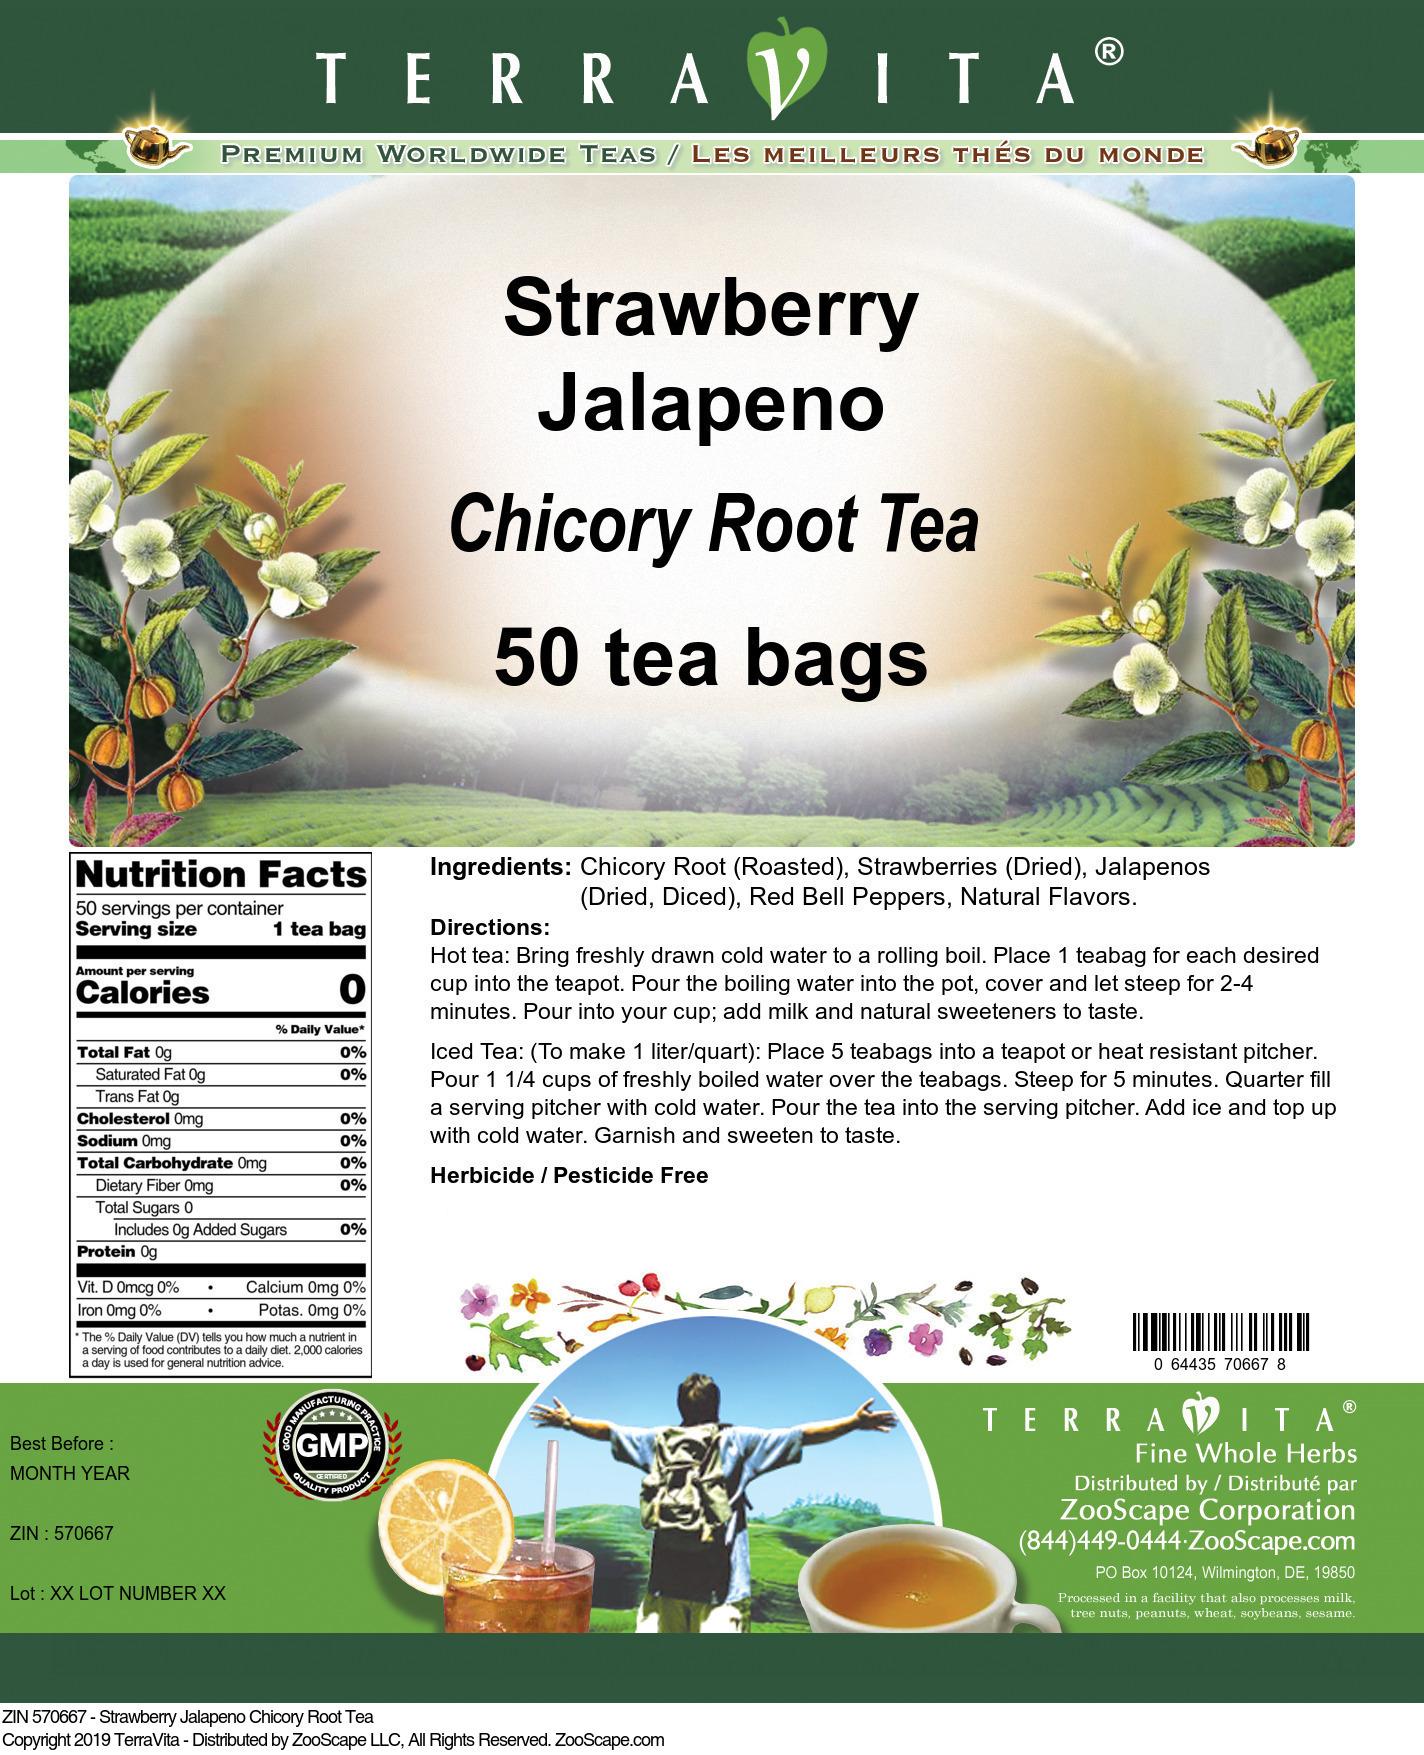 Strawberry Jalapeno Chicory Root Tea